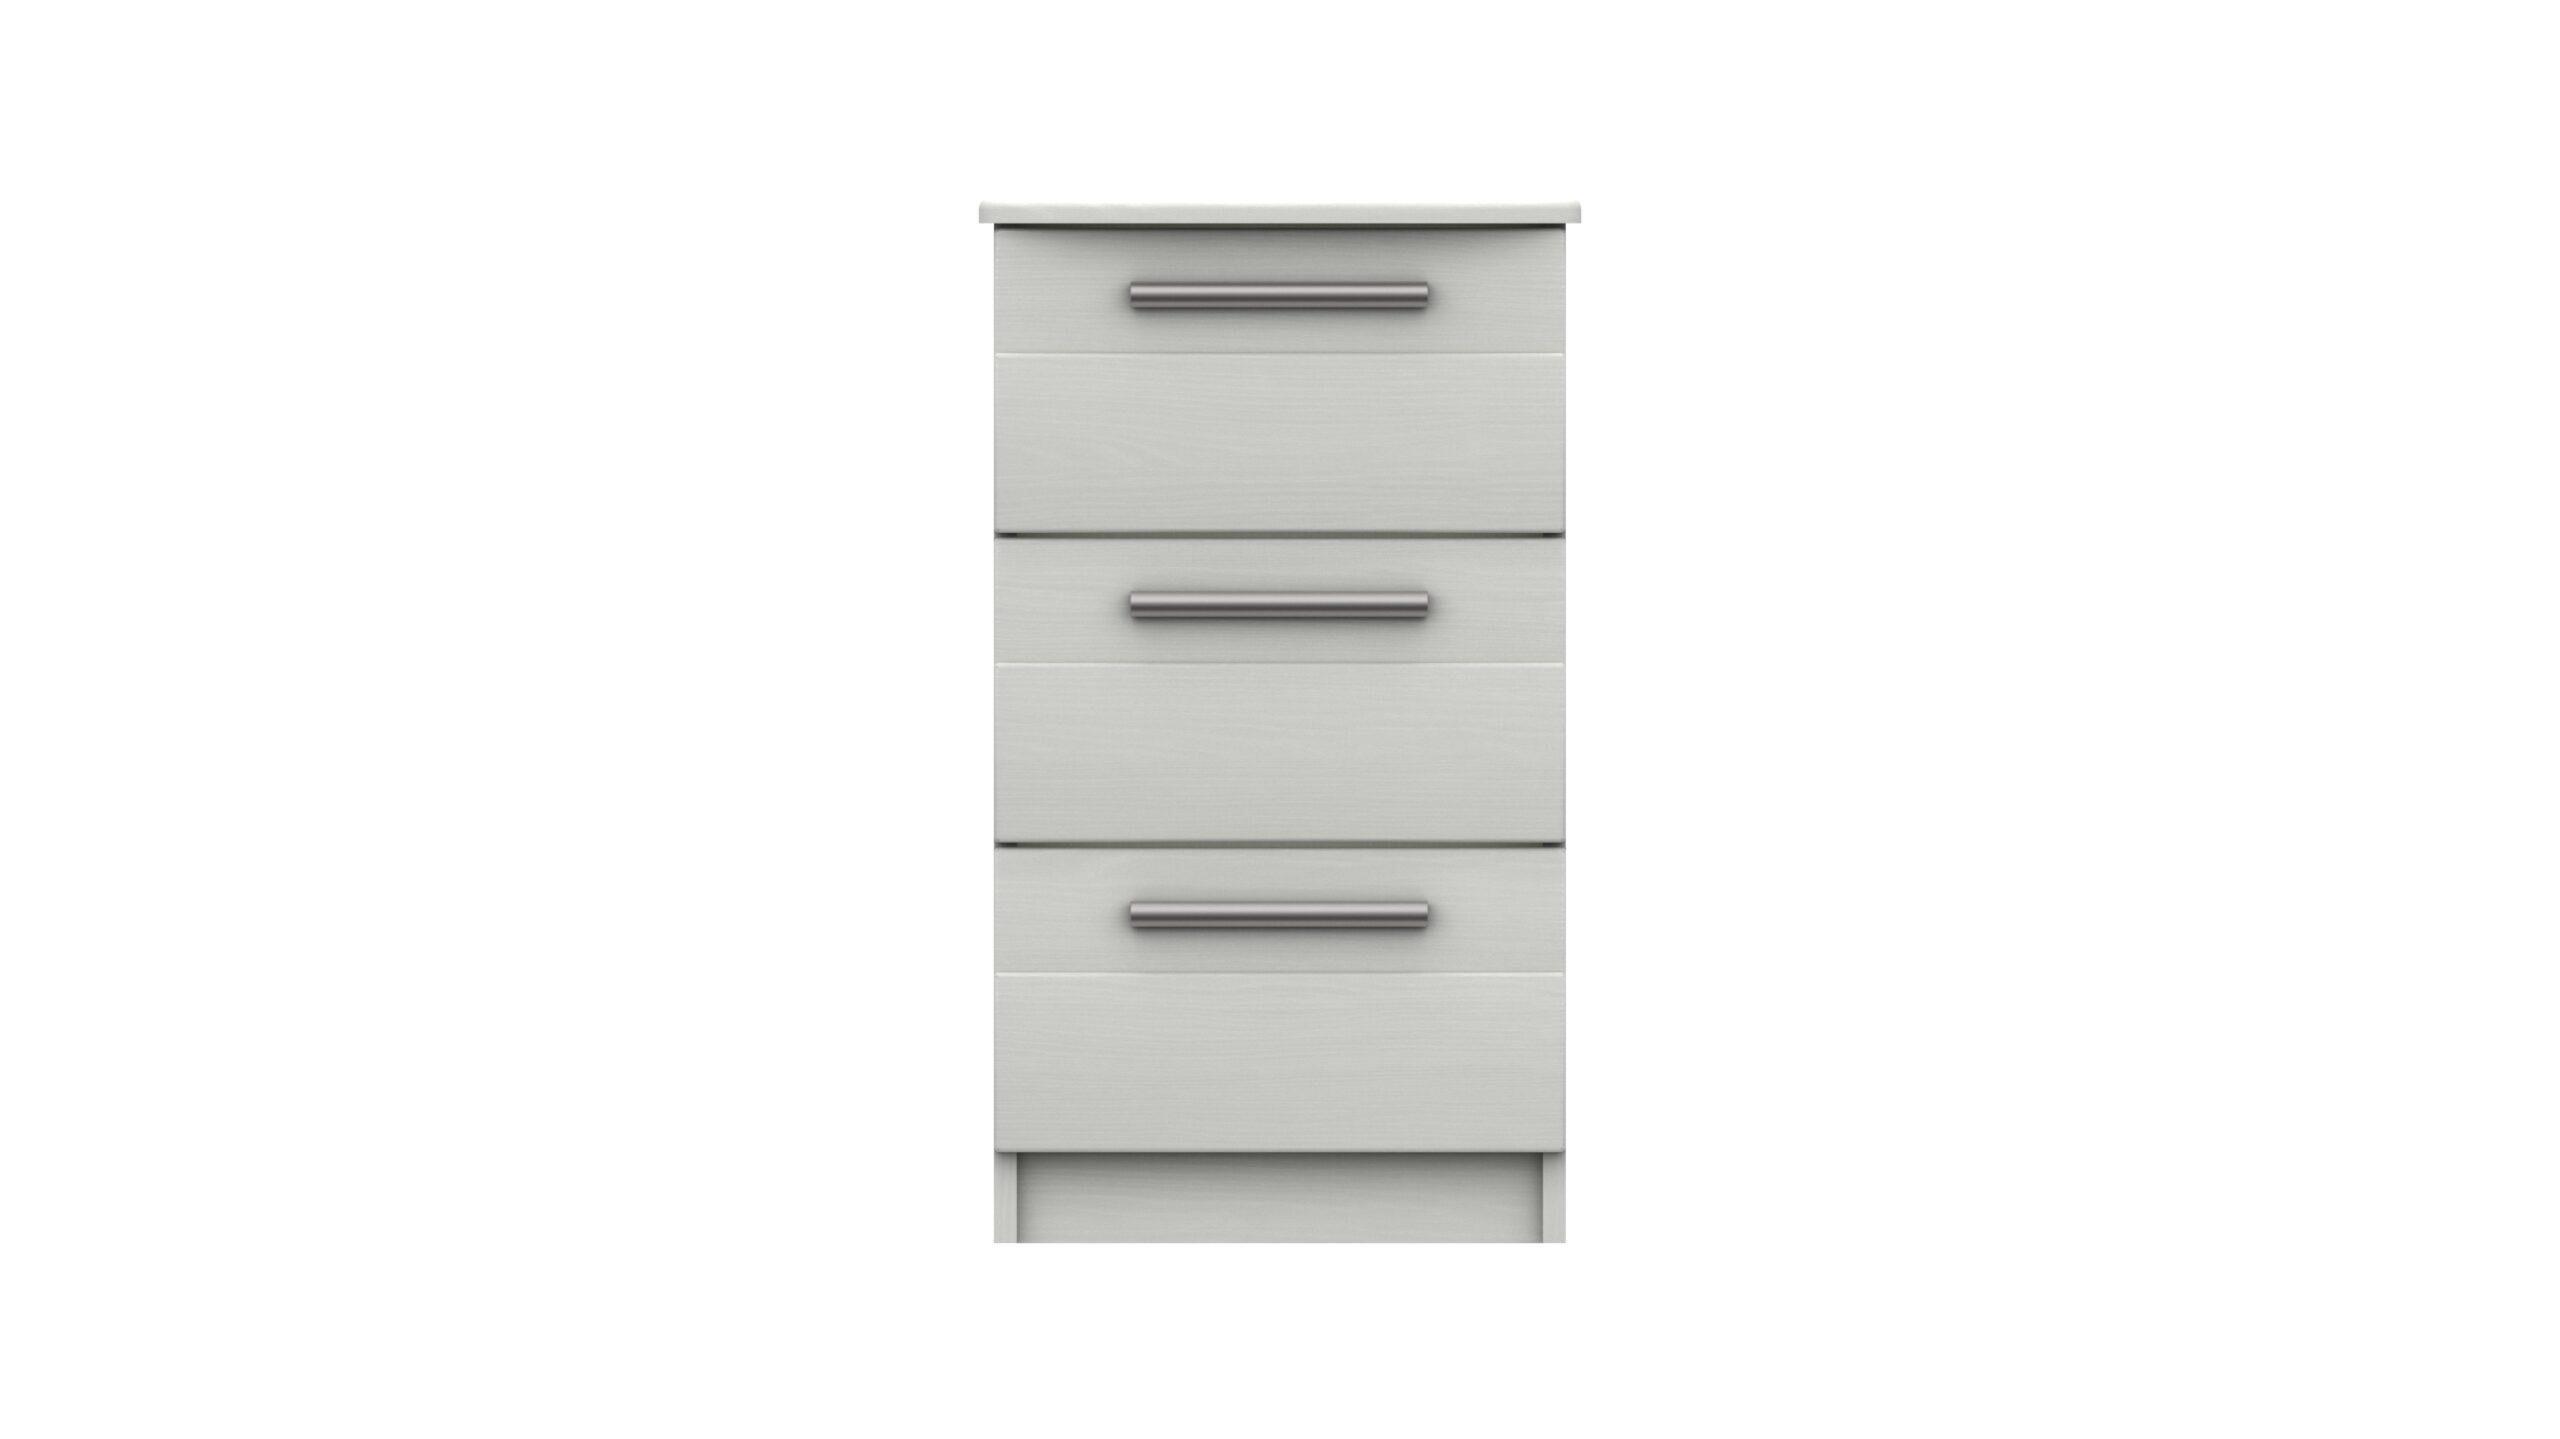 Midas Three Drawer Bedside Table - White Woodgrain